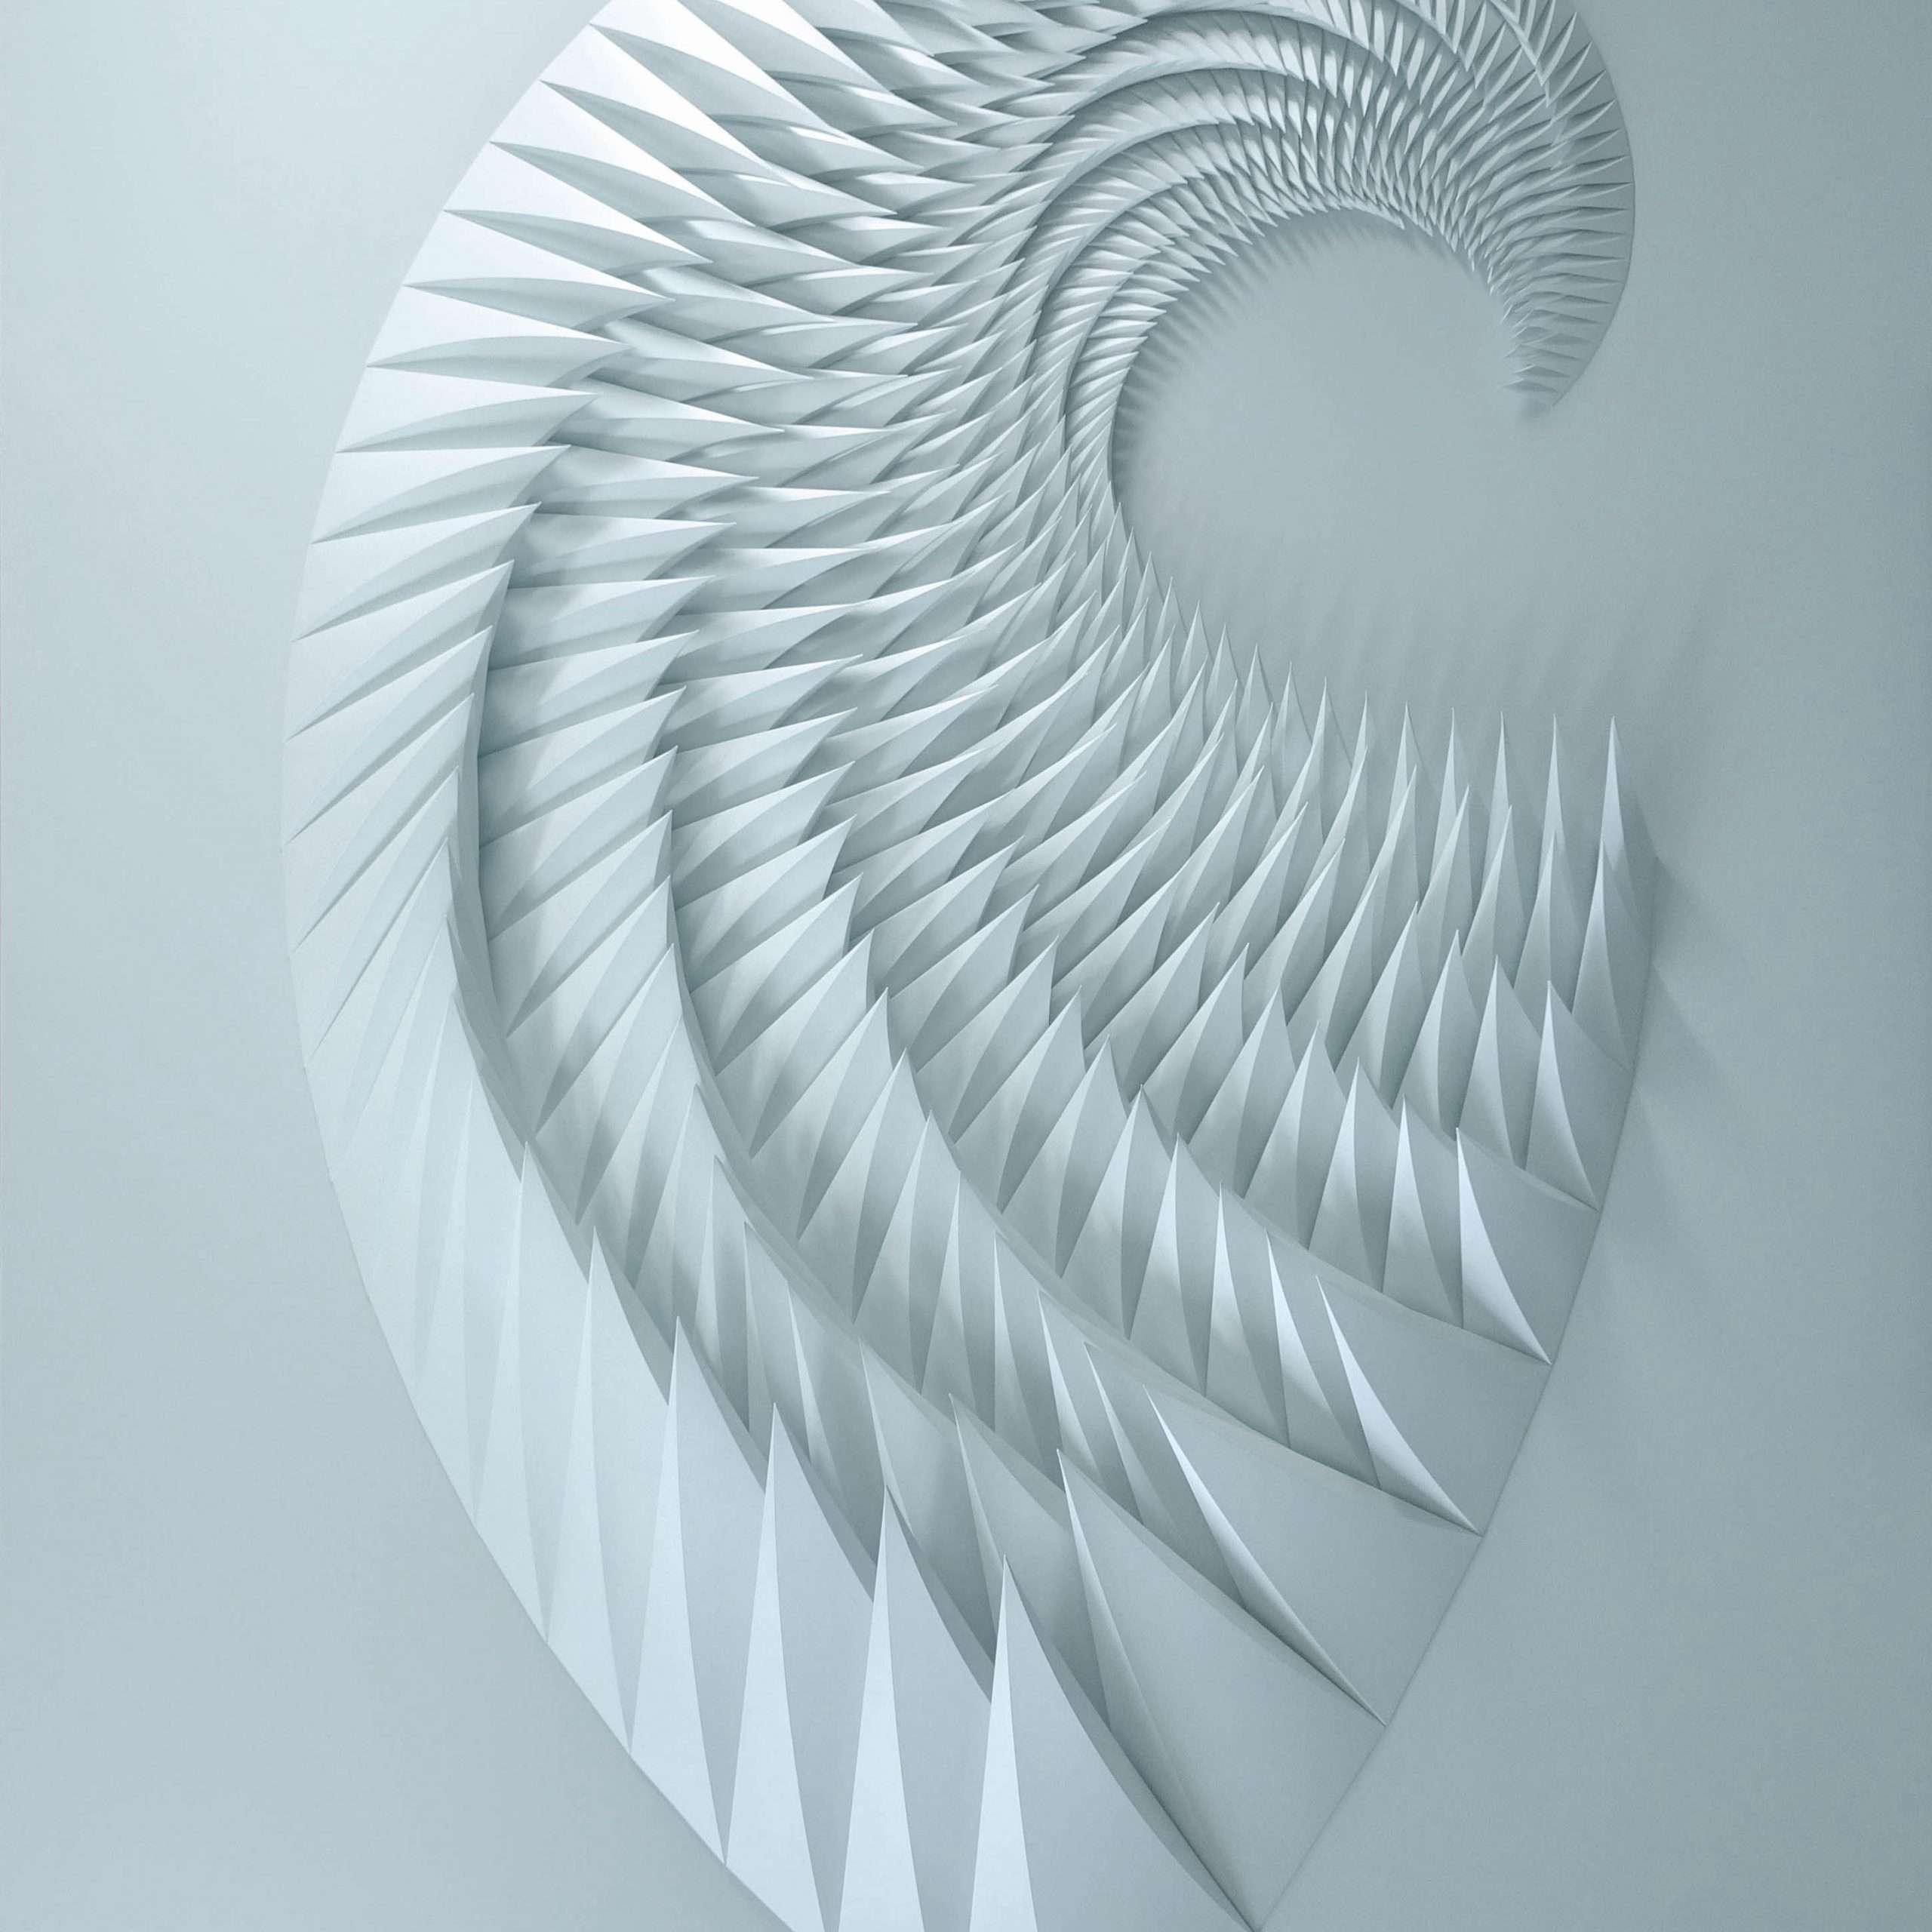 unholy 293 48 x 72 x 4 celadon iridescent paper 42000 retail scaled